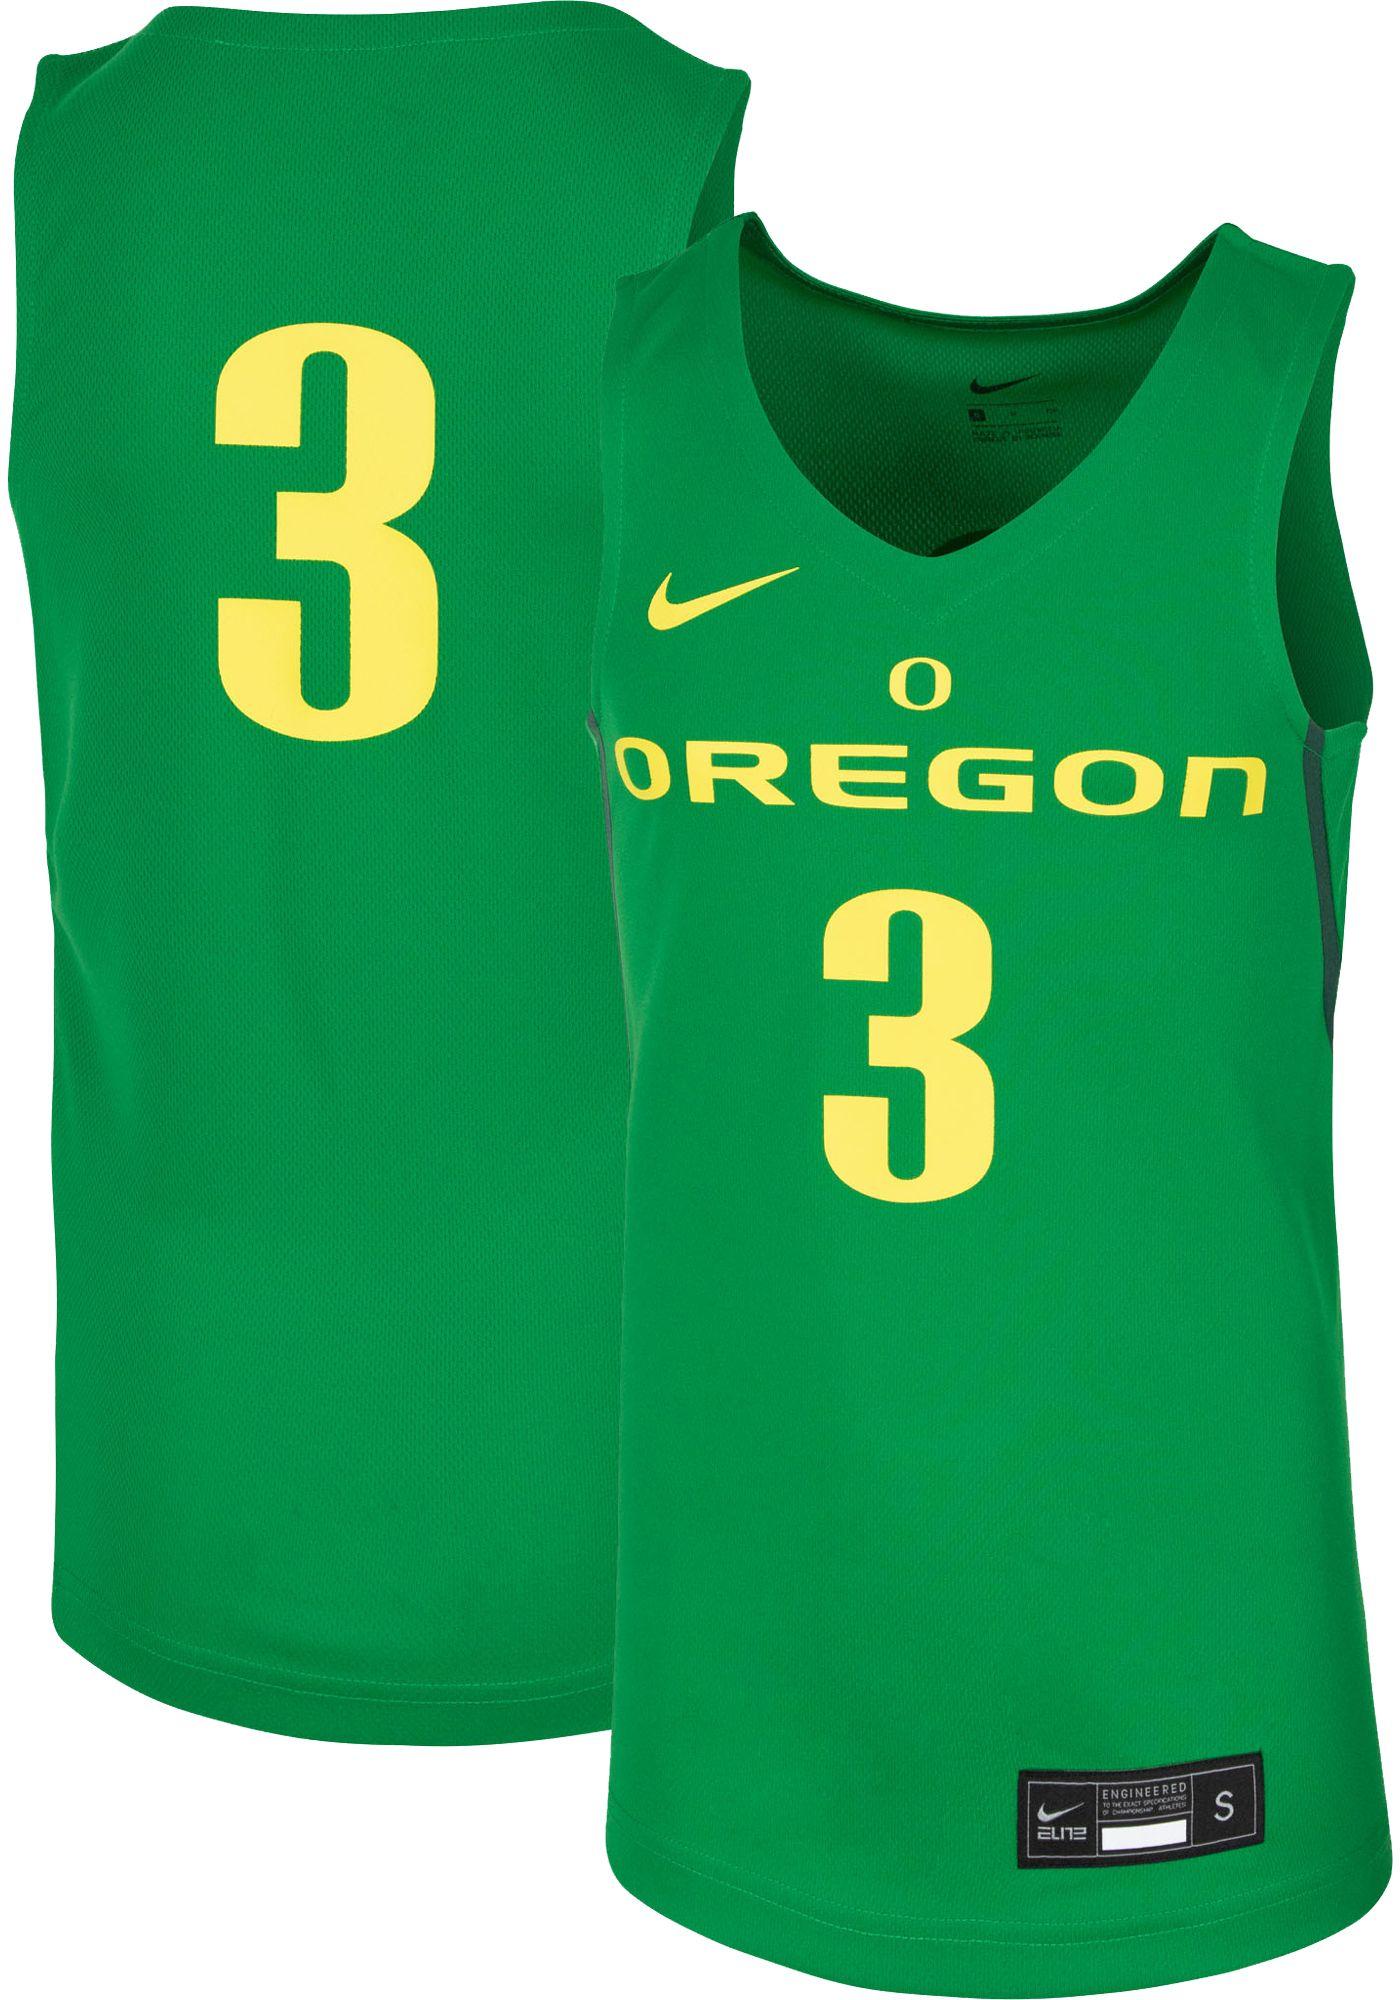 Nike Youth Oregon Ducks #3 Green Replica Basketball Jersey